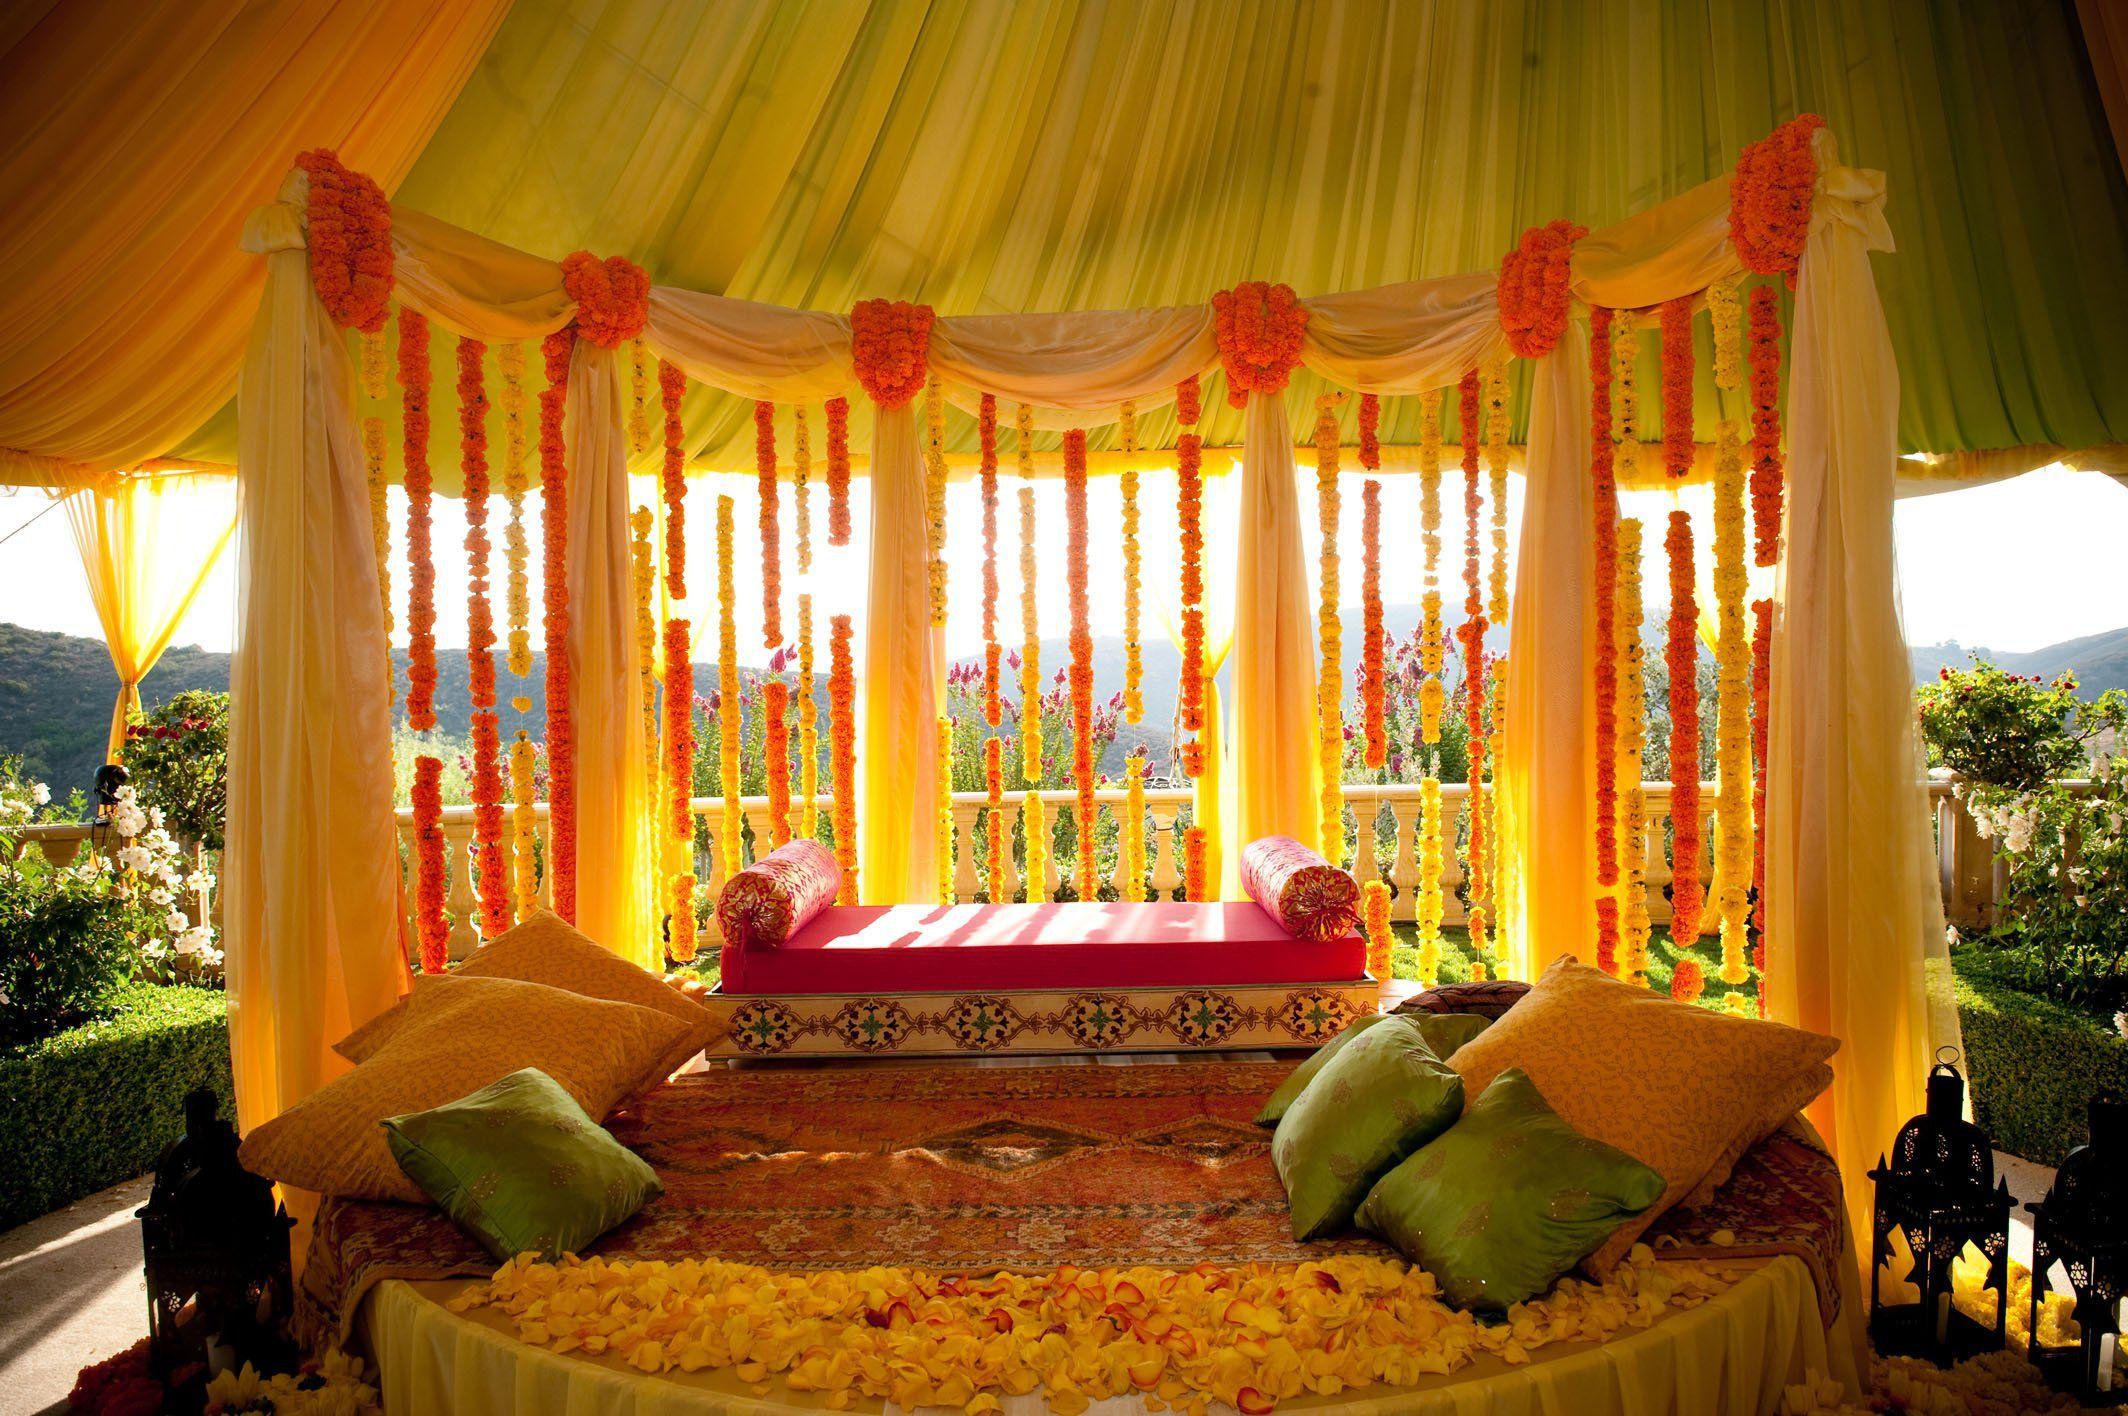 Indian weddings mehendi decor indian wedding decorator muslim indian weddings mehendi decor indian wedding decorator muslim wedding best home decorators junglespirit Images